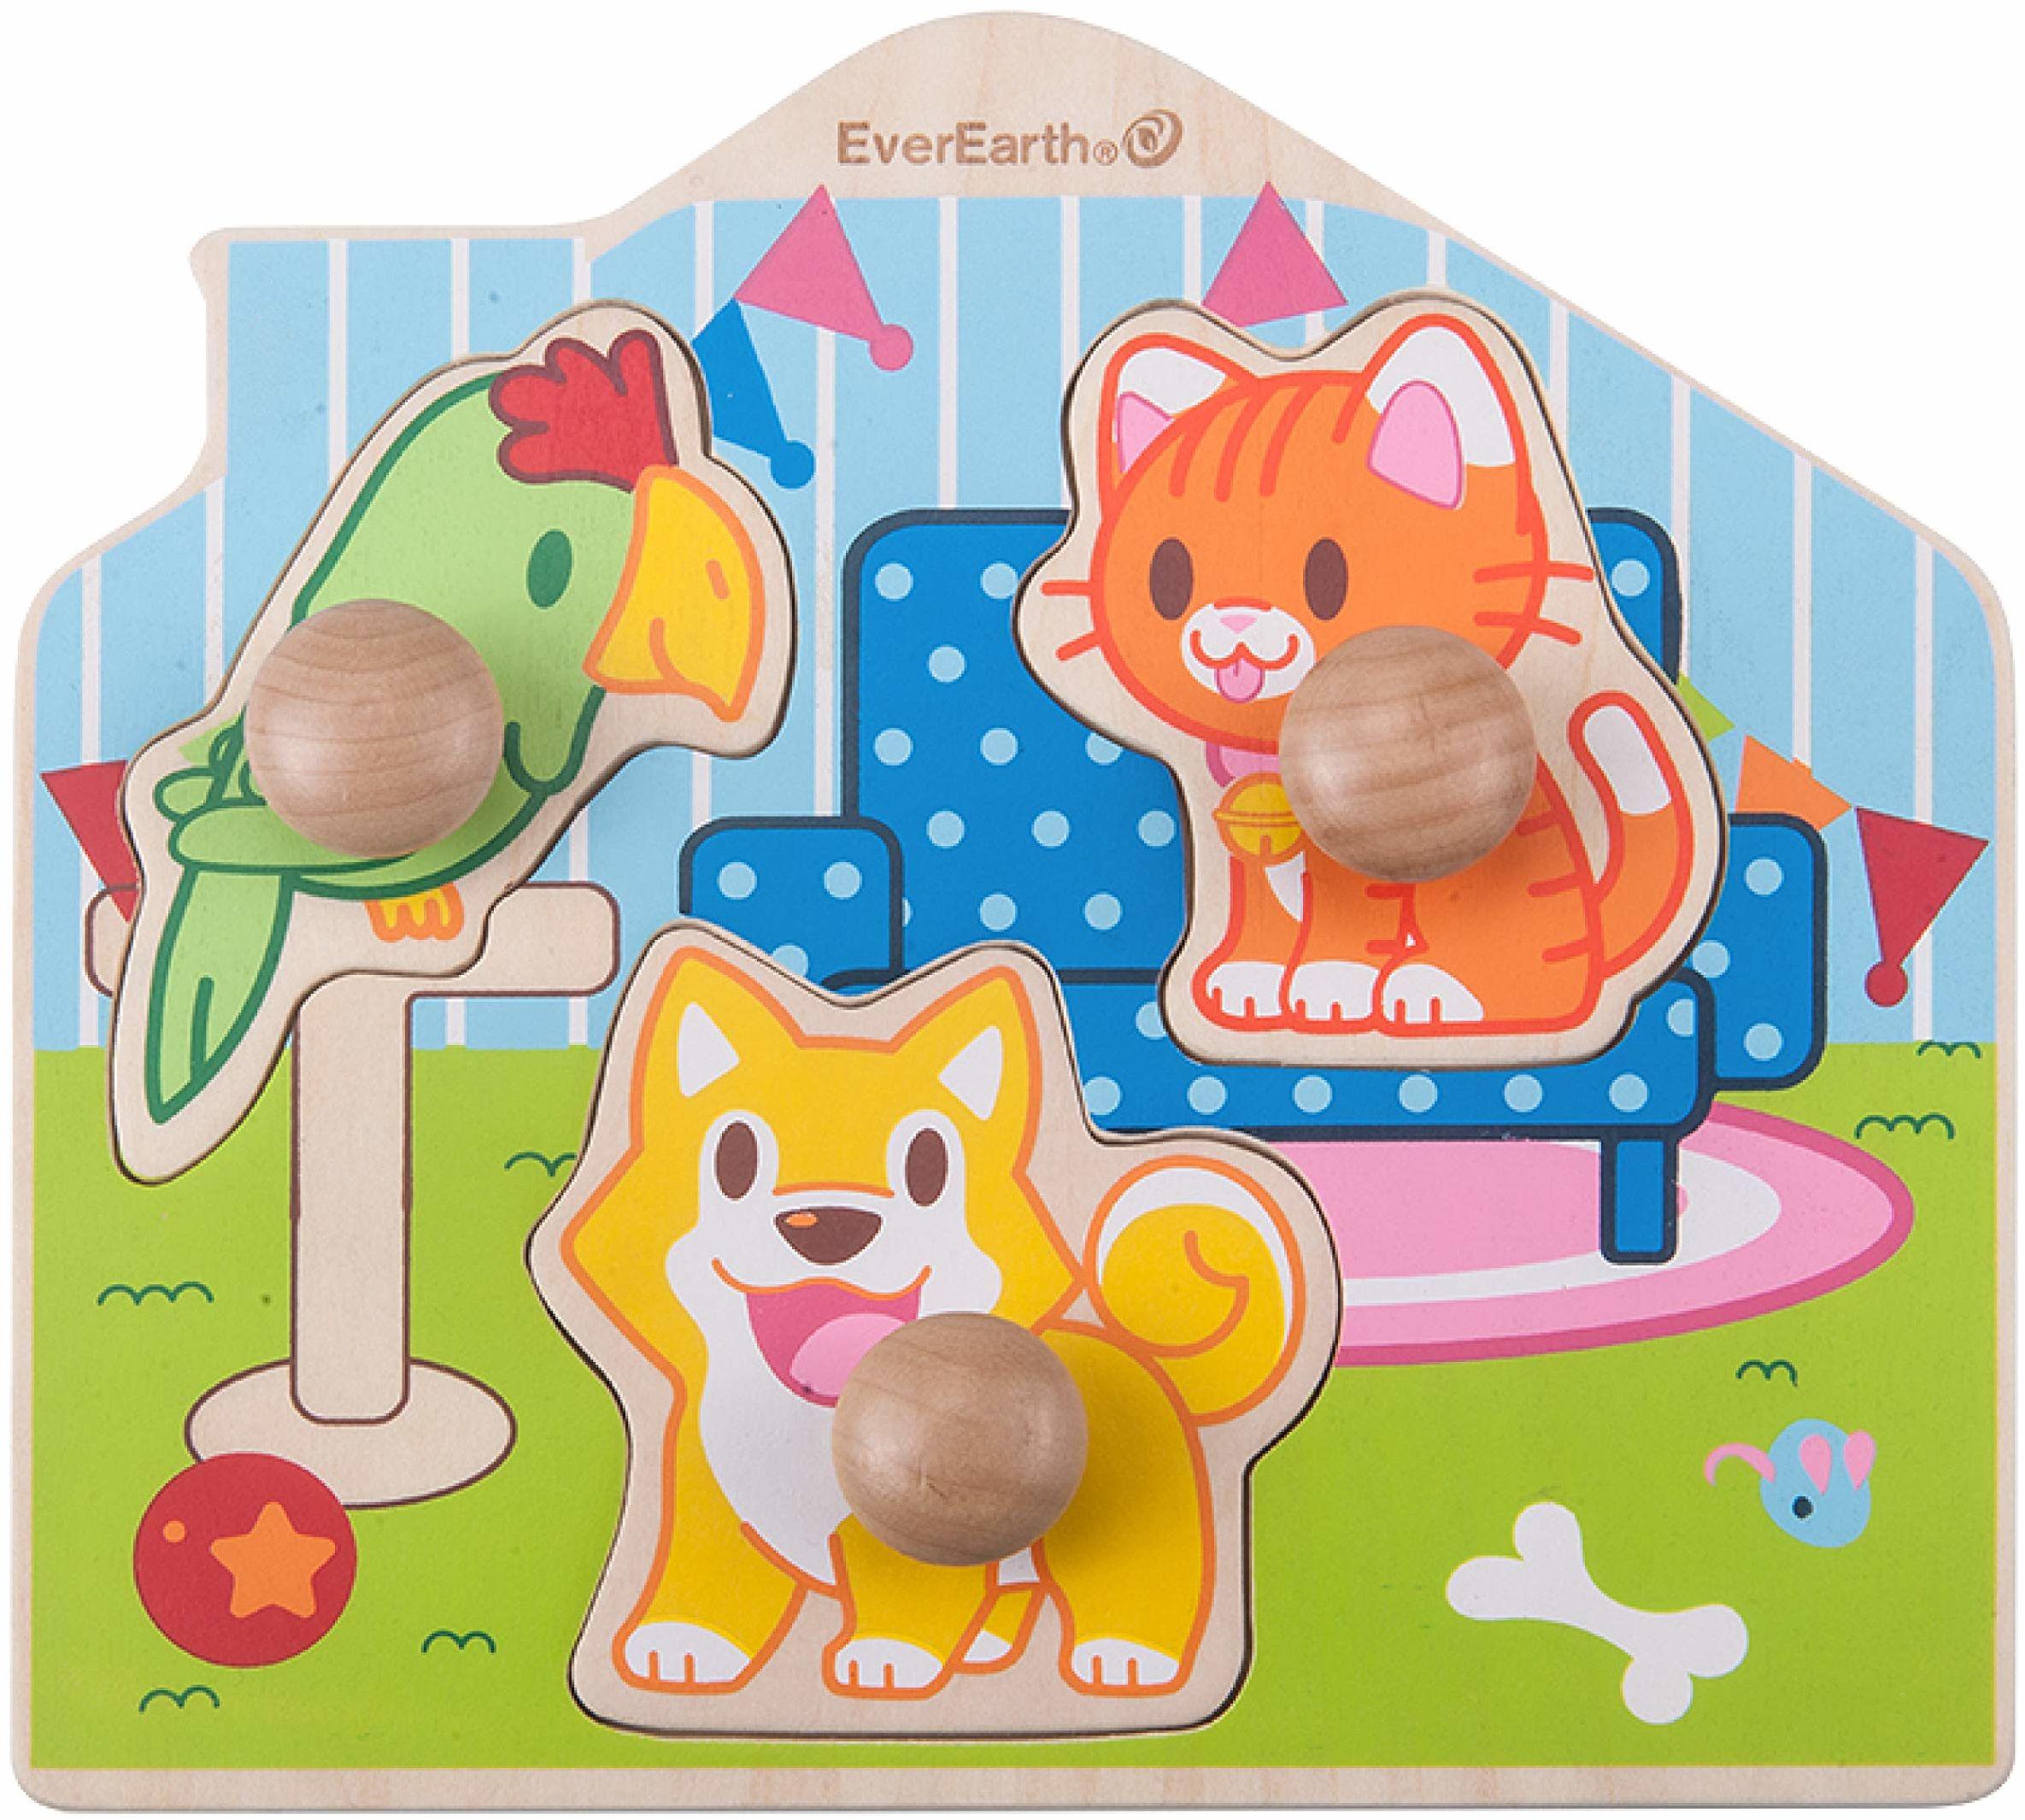 "EverEarth - puzzle""zwierzęta domowe"" (EE33733)"